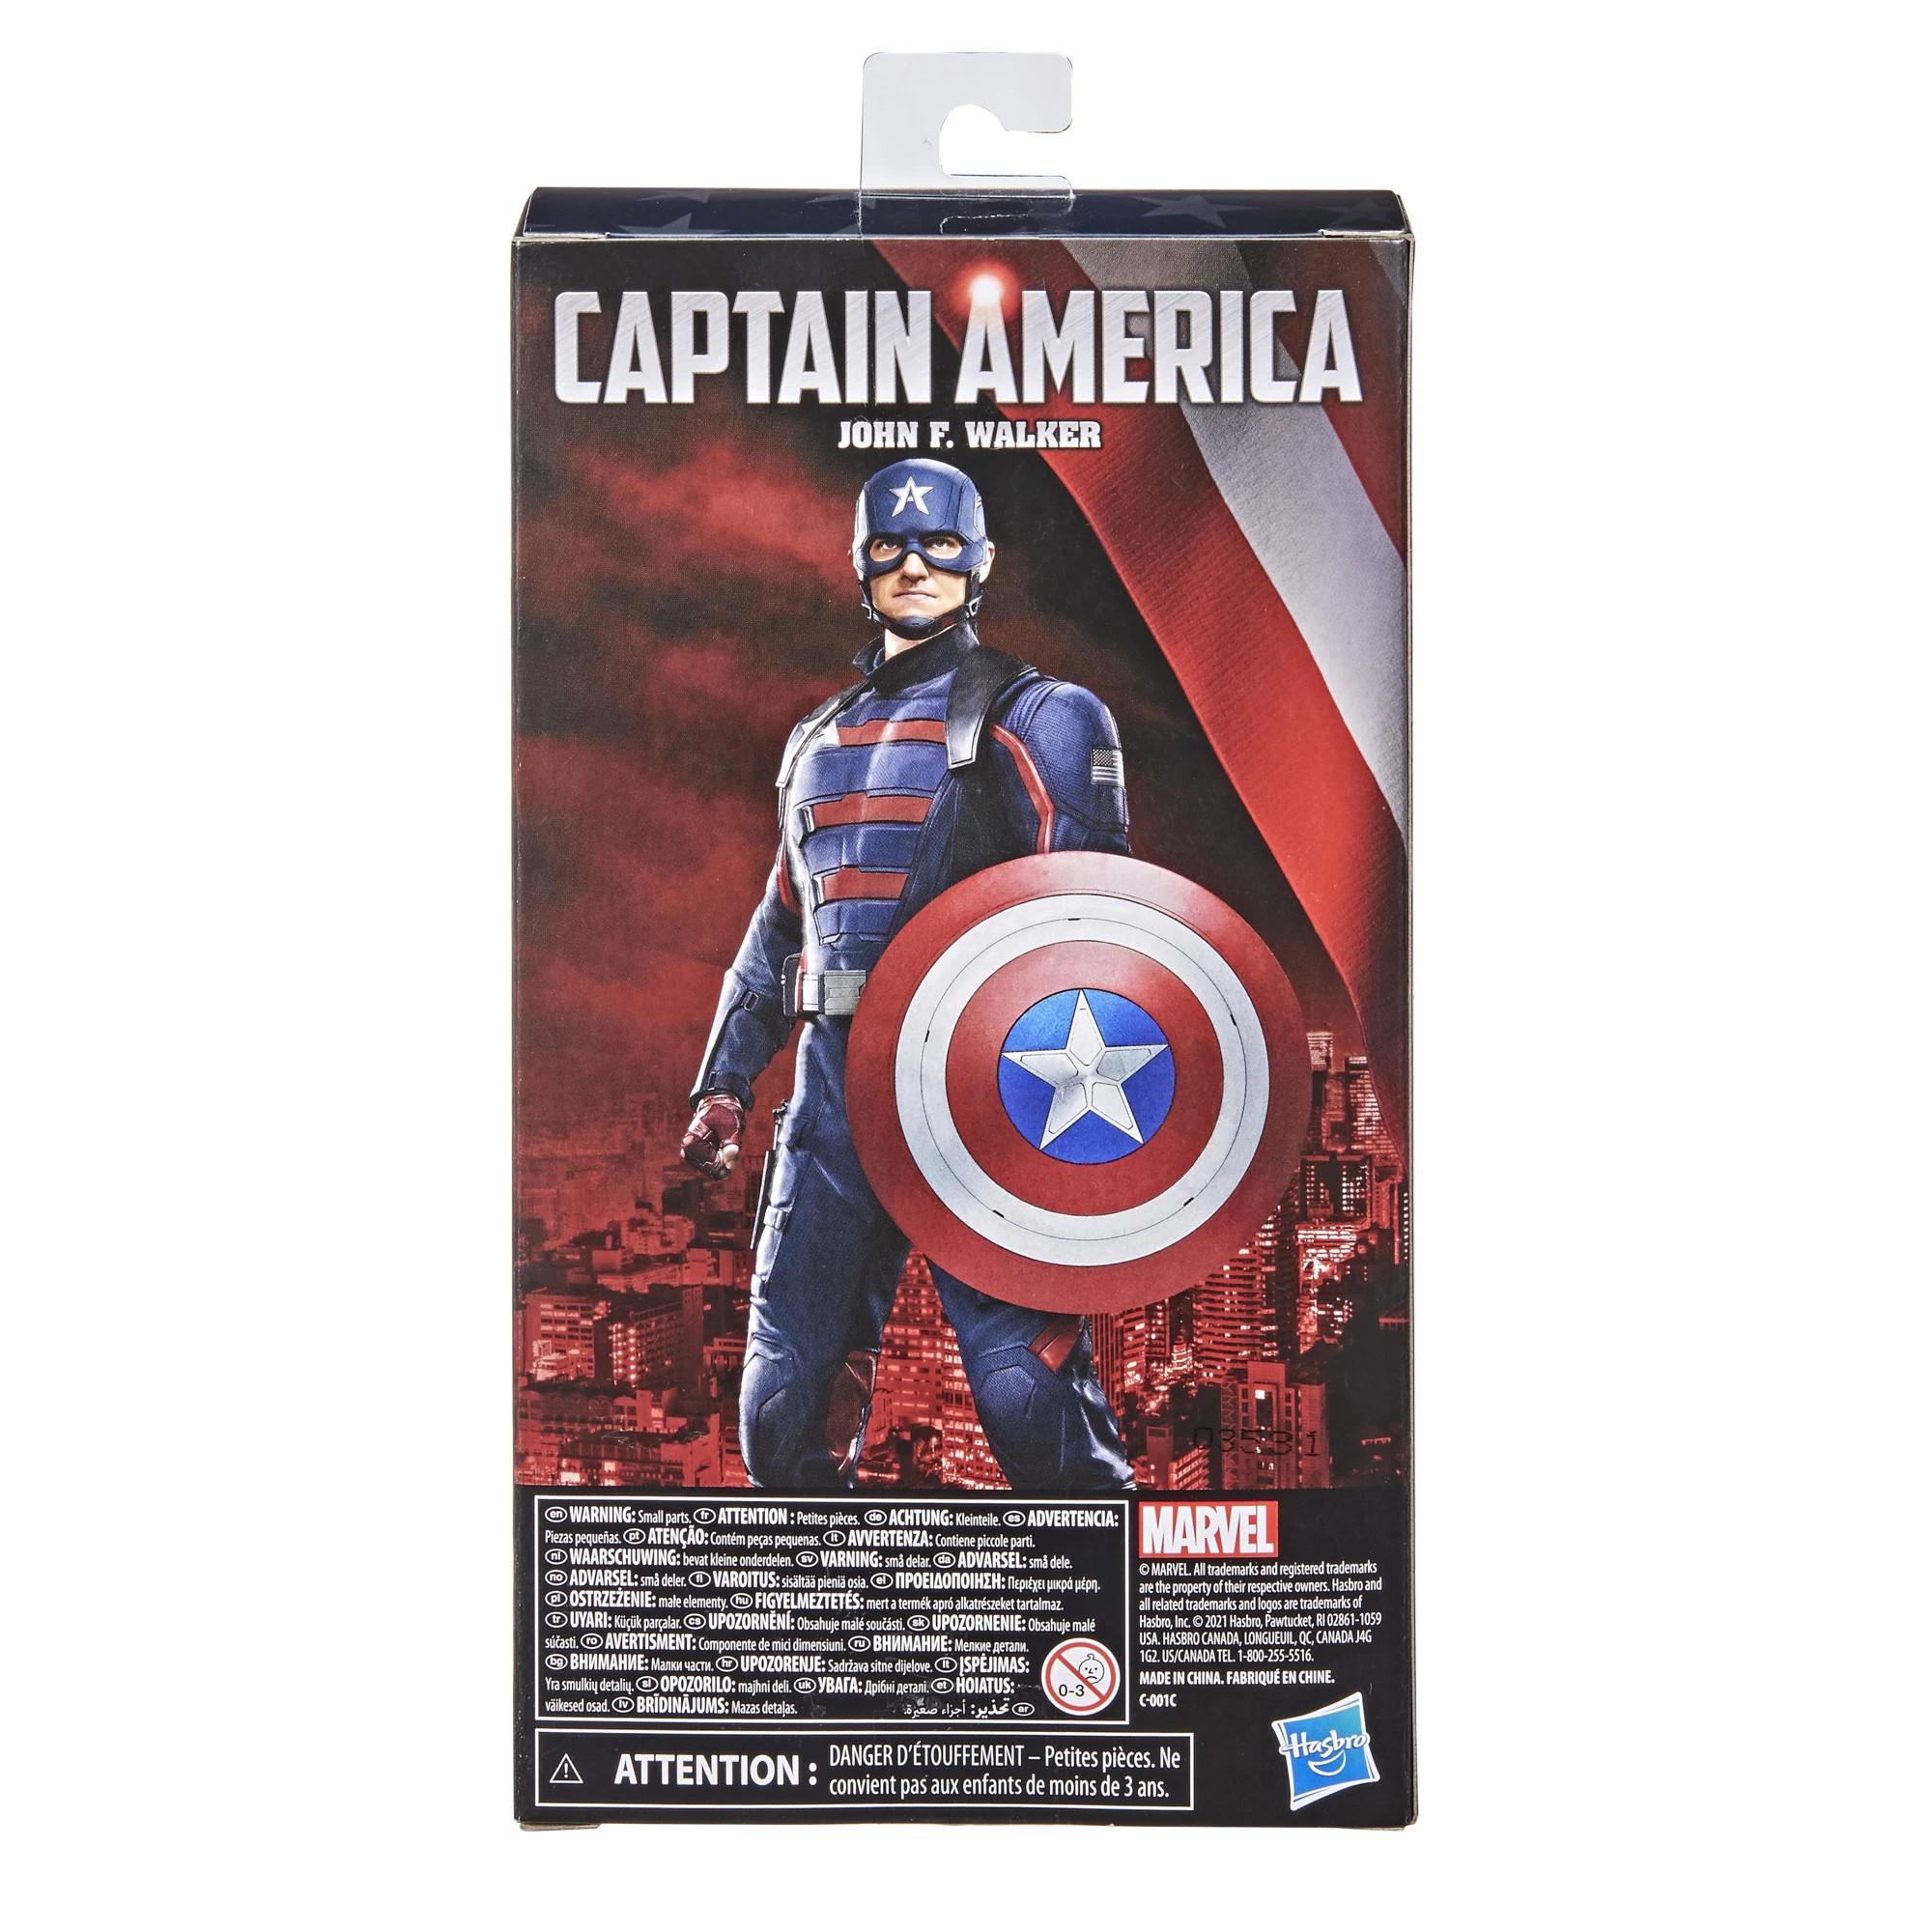 Hasbro: Marvel Legends Falcon and Winter Soldier John F. Walker Captain America Promo Pics and Info – Fwoosh